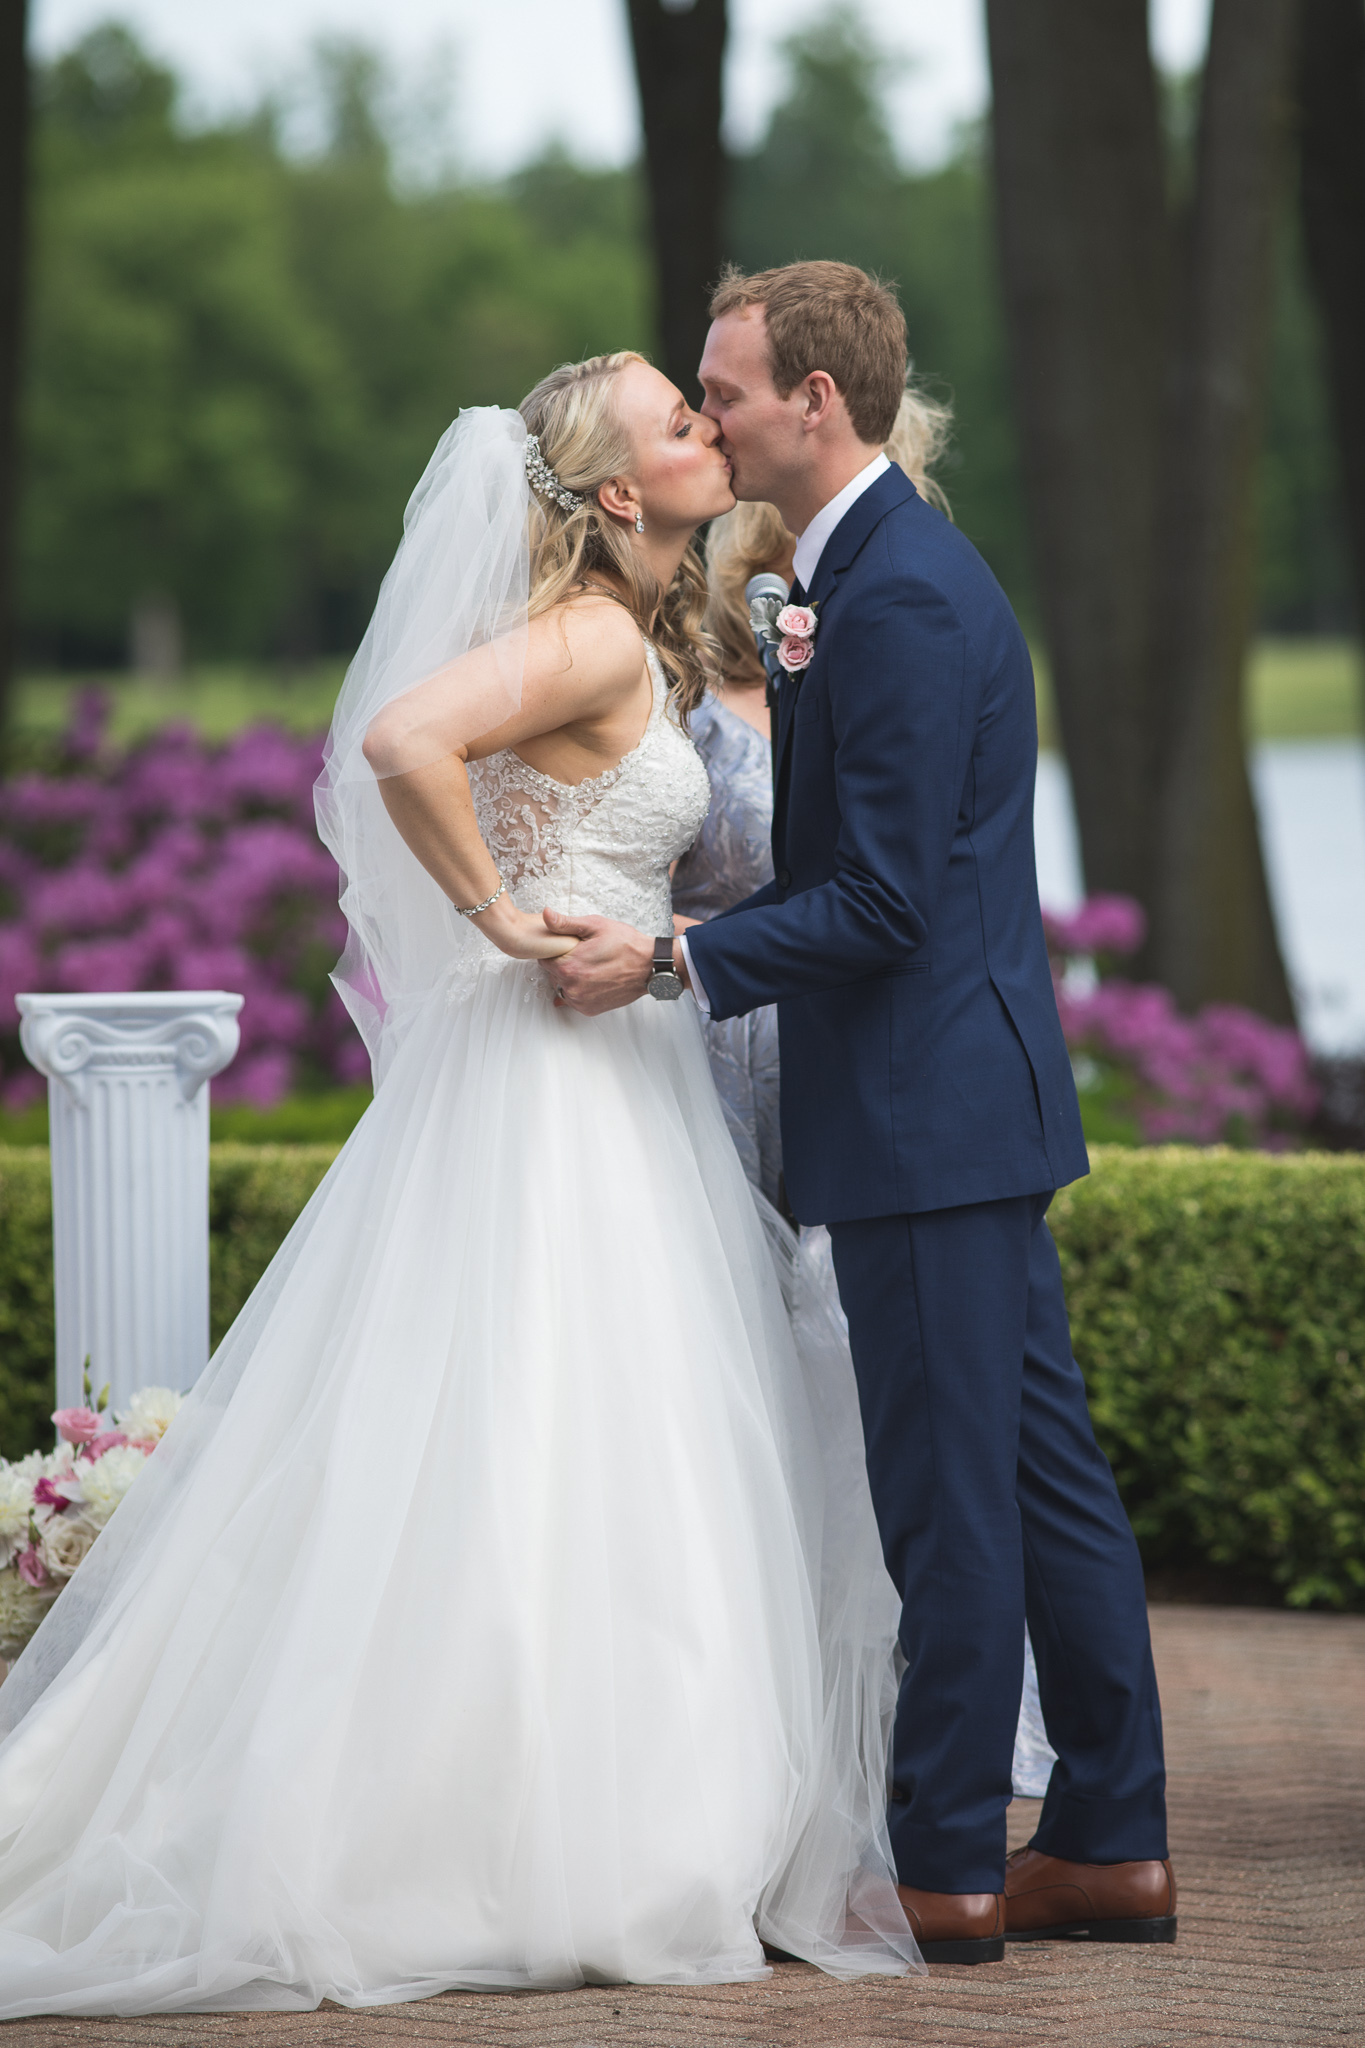 096-best-detroit-michigan-outdoor-wedding-photographer.jpg